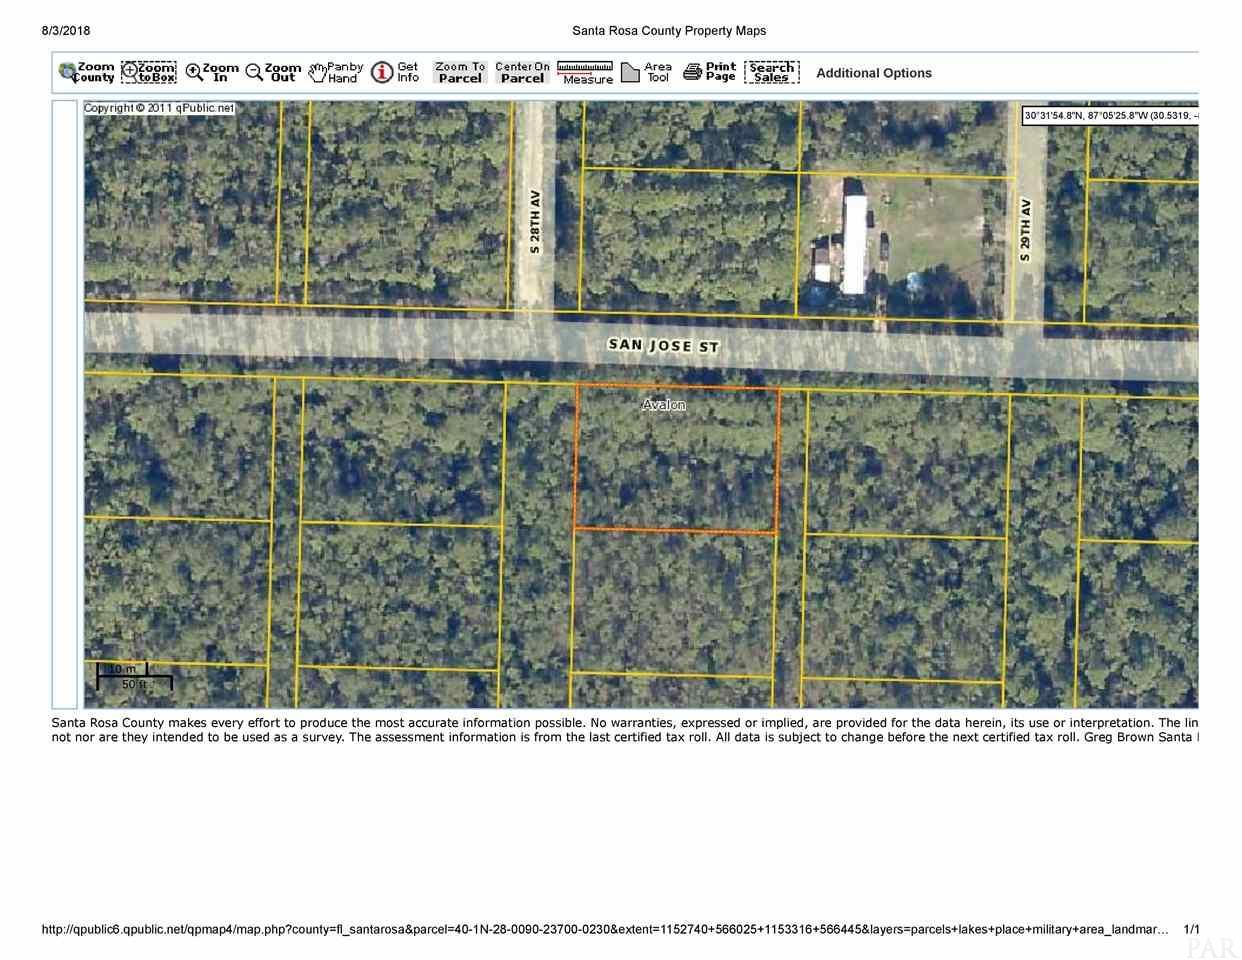 Lot 23blk 237 San Jose, Milton, FL 32583